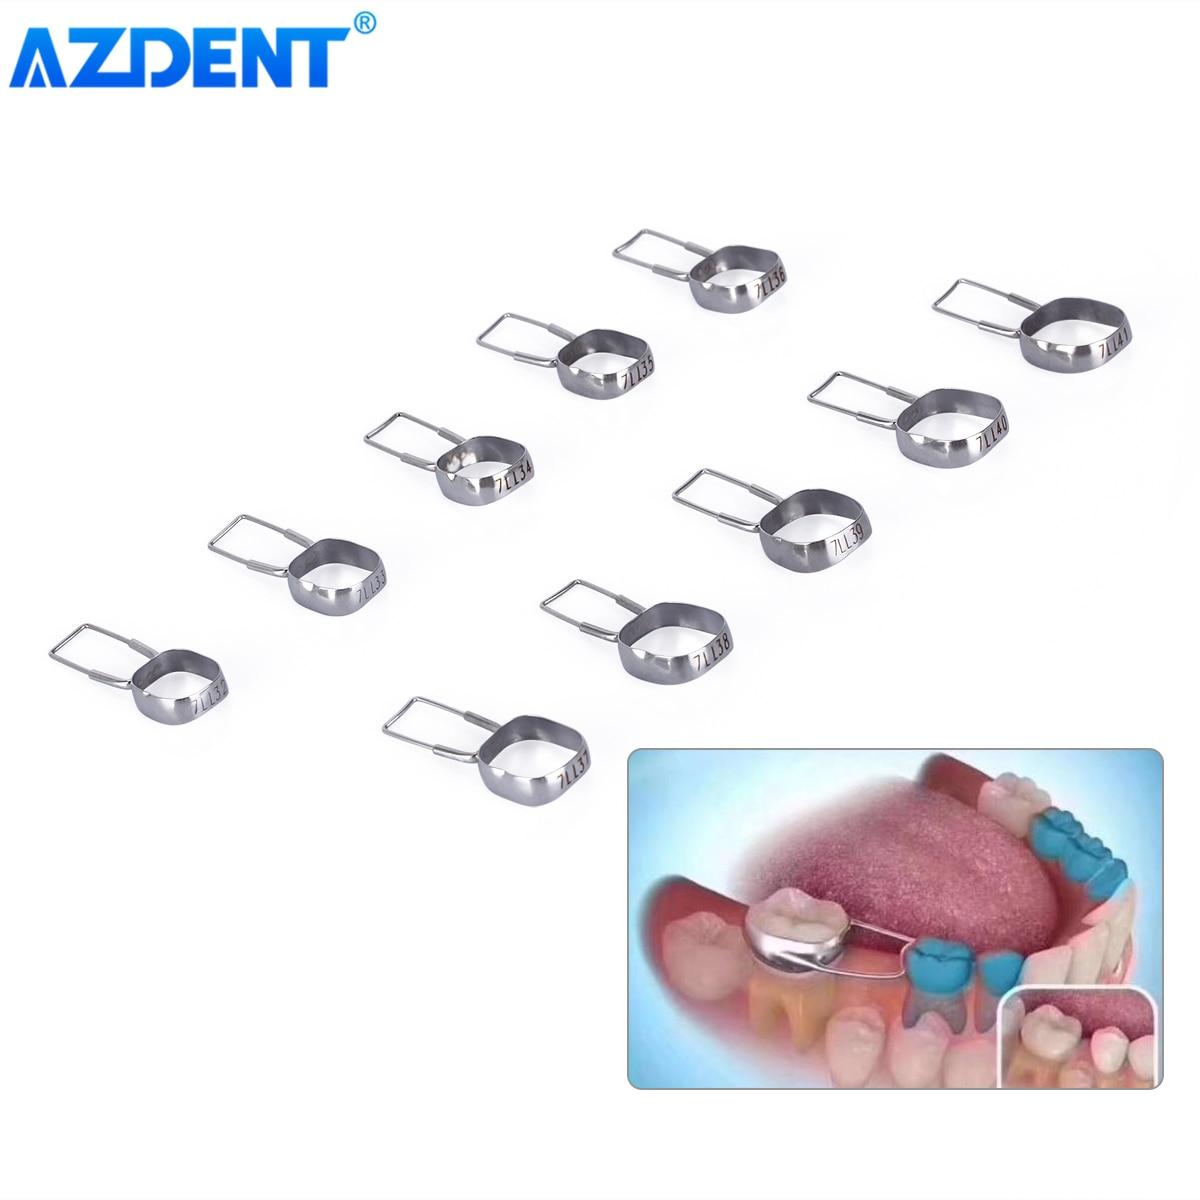 AZDENT שיניים אורתודונטי מייצבת פלטה פער Preformed 2nd טוחנת שטח מתחזק להקות 32 #-41 #